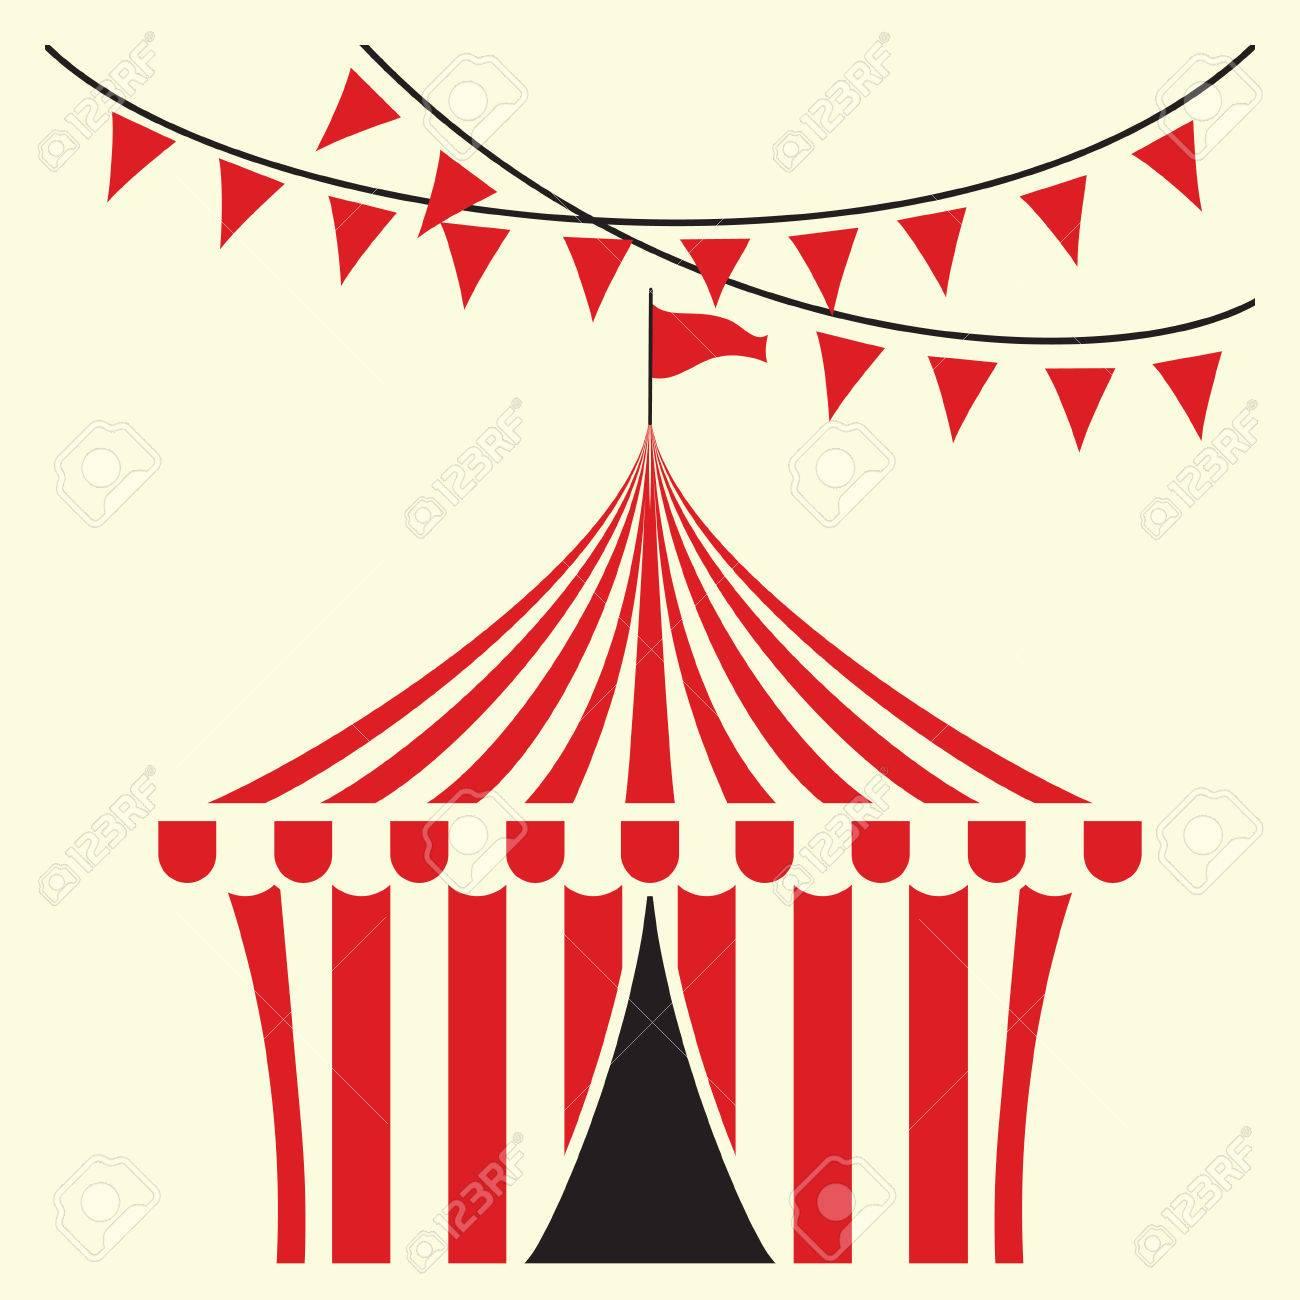 Circus tent illustration - 41503904